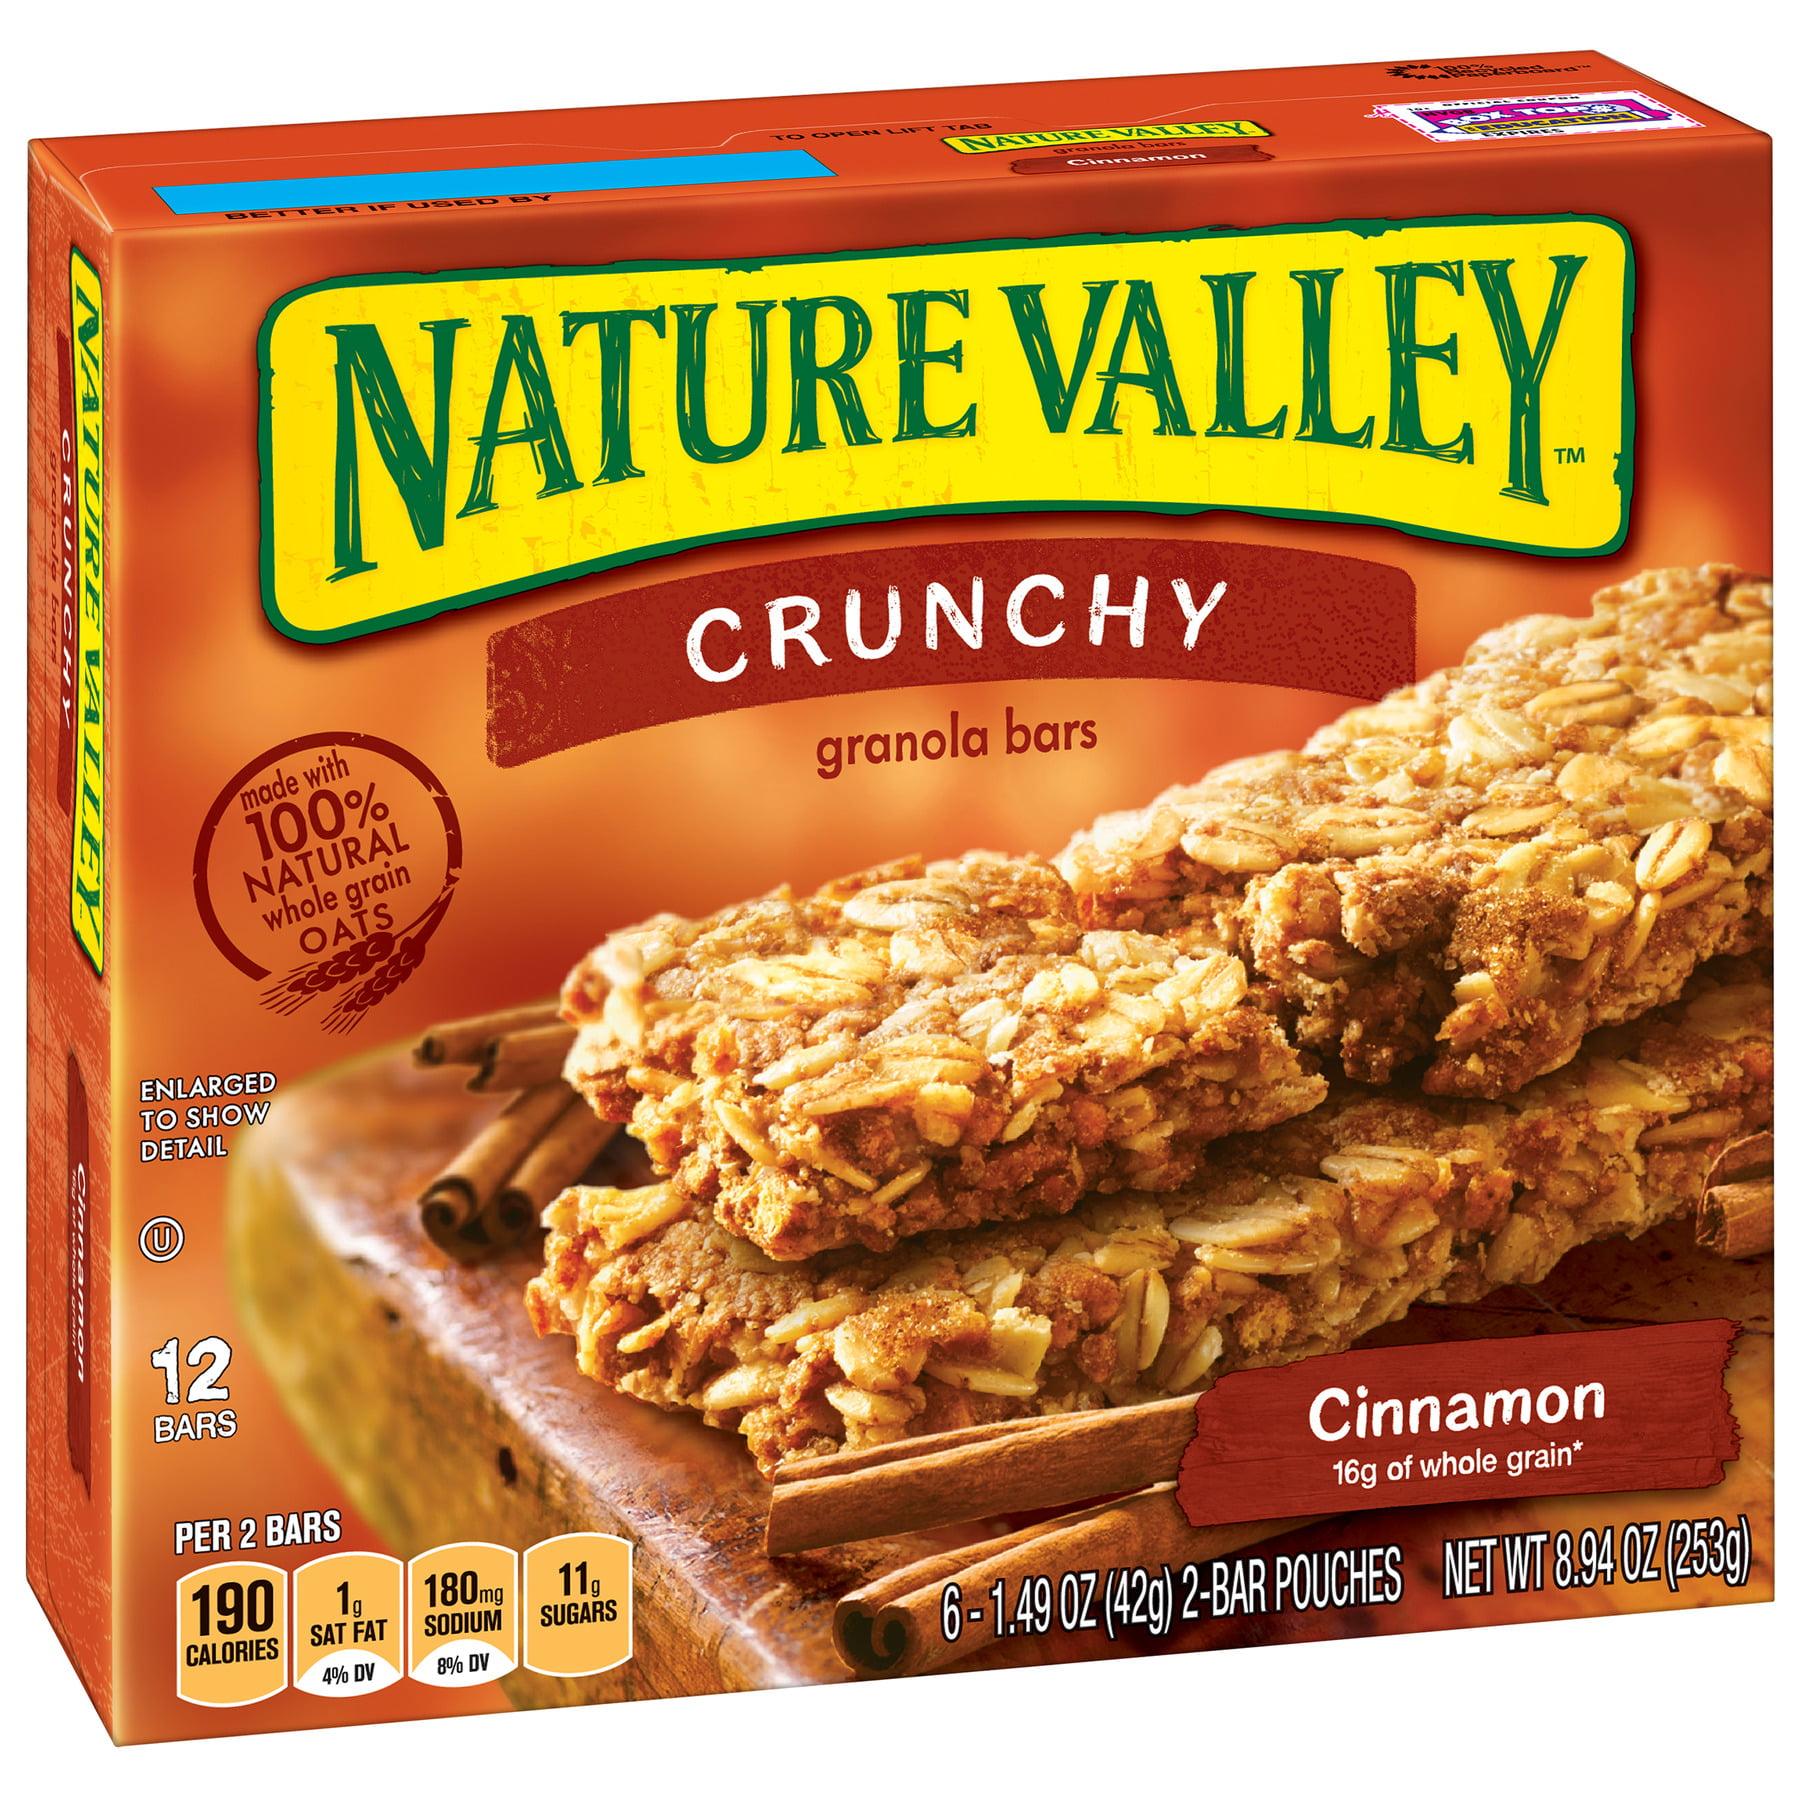 (3 Pack) Nature Valley Cinnamon Crunchy Granola Bar 12 Bars, 8.94 oz